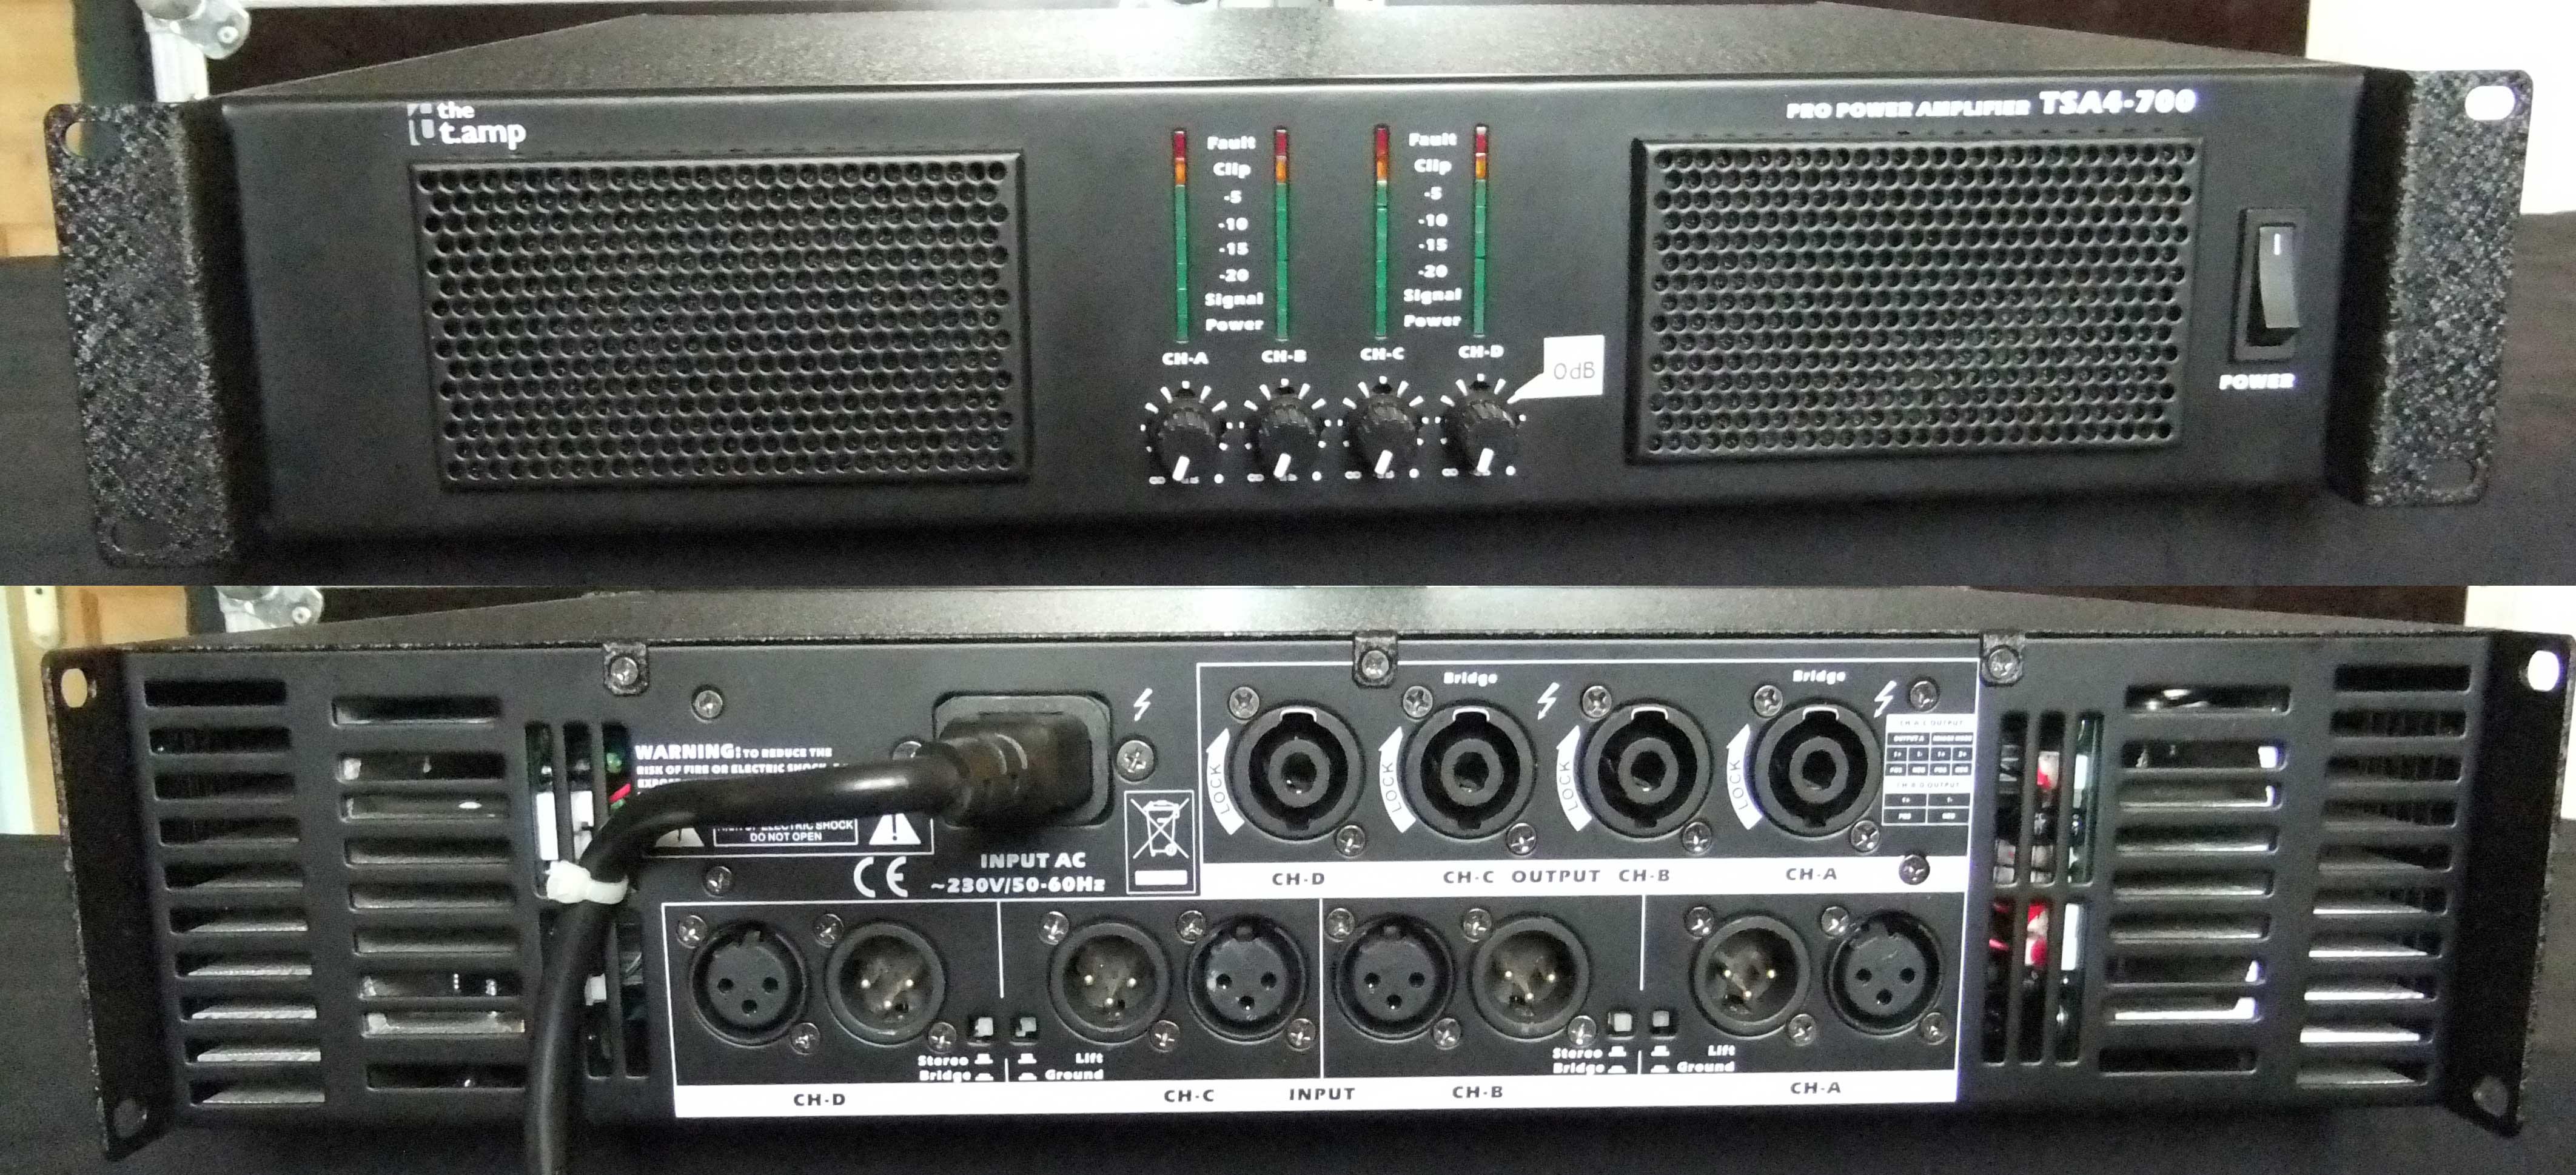 T.AMP TSA4-700 OWNER'S MANUAL Pdf Download.